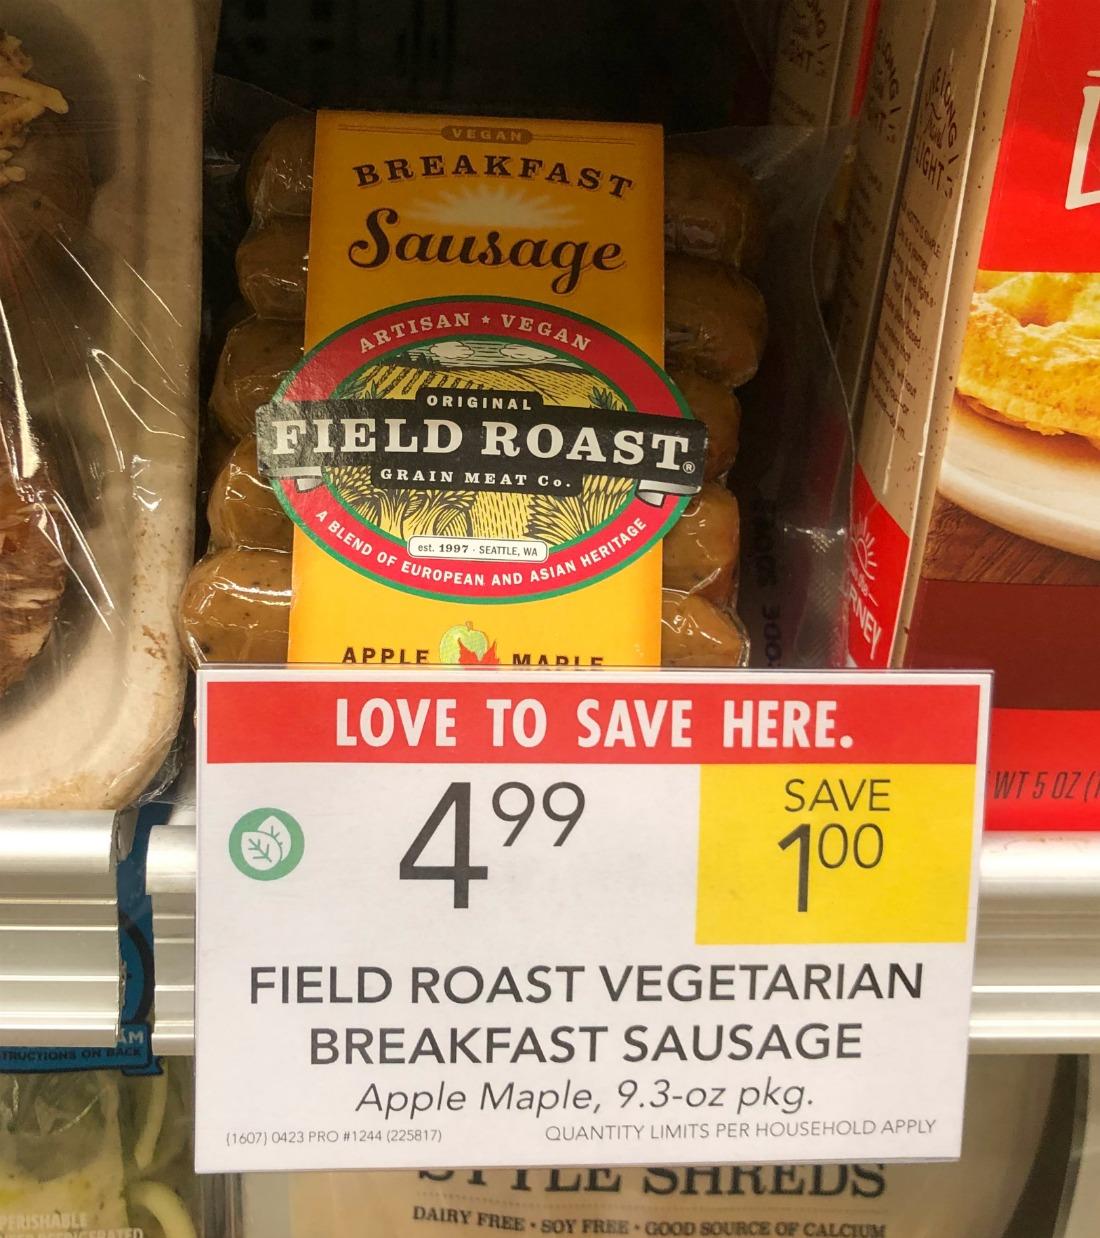 Field Roast Vegetarian Breakfast Sausage Just $3.49 At Publix (Save $2!) on I Heart Publix